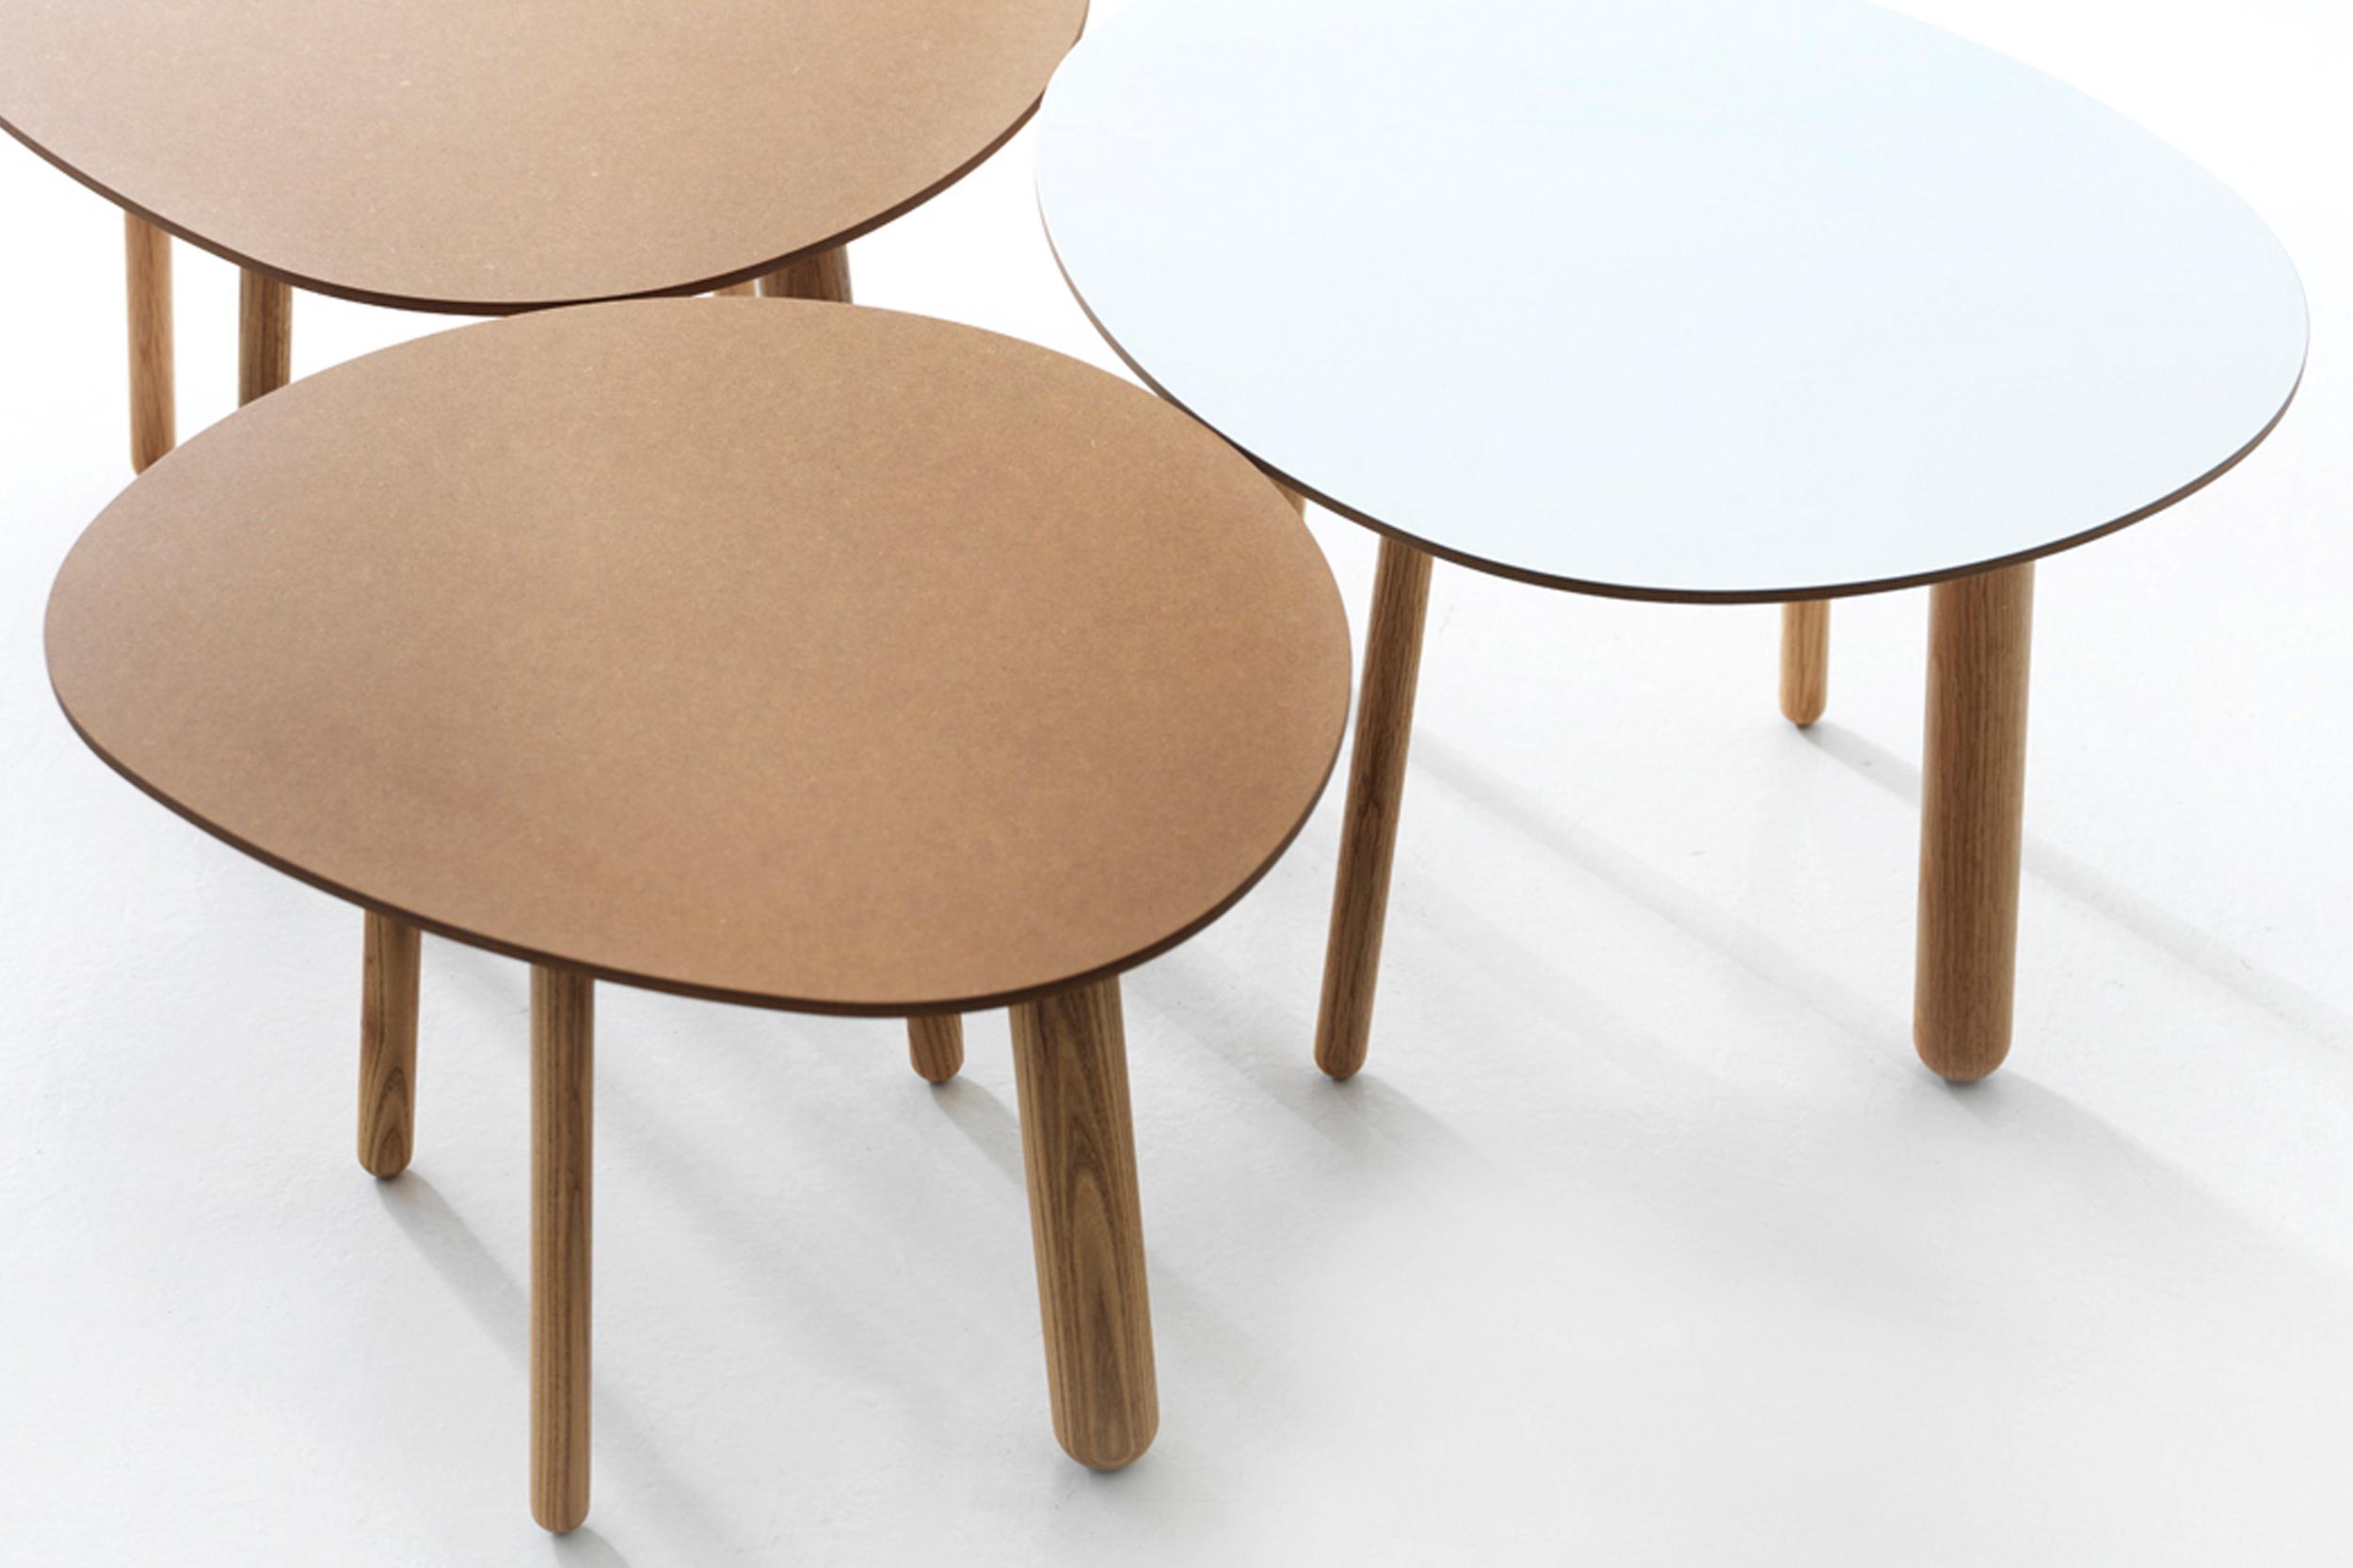 Morris coffee table model 1 in mdf, model 5 in mdf and model 6 in white